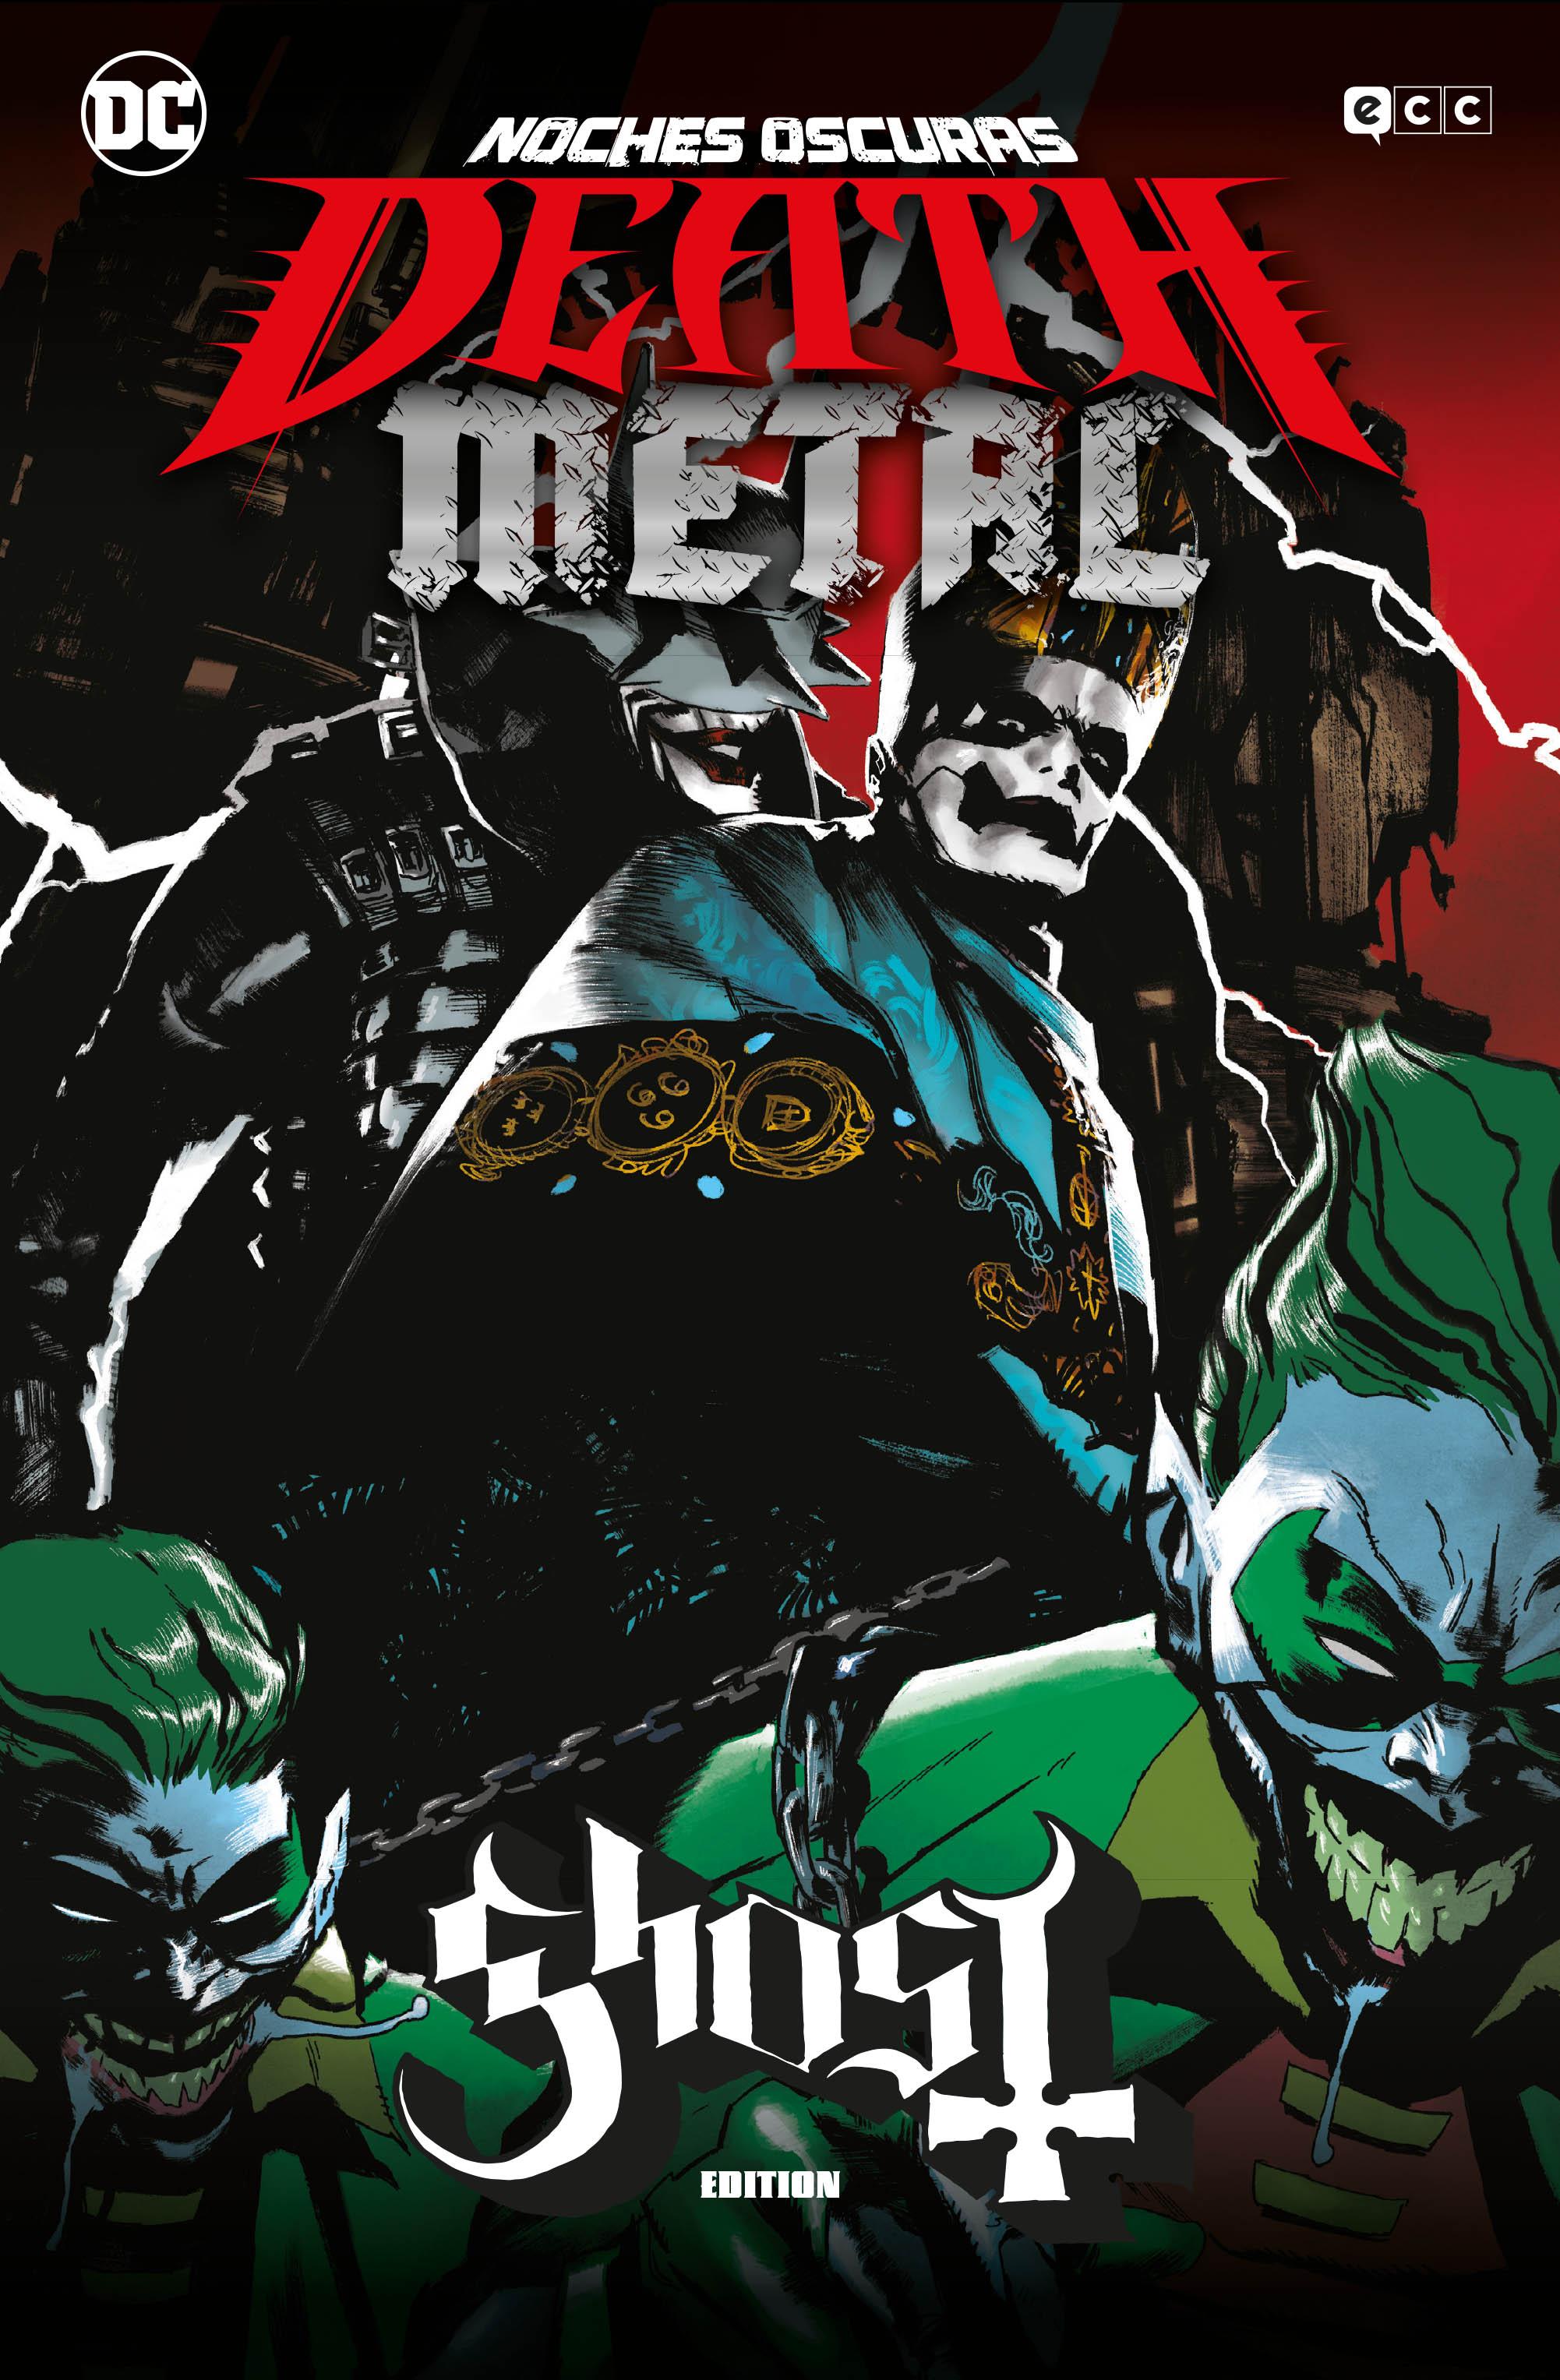 Noches Oscuras: Death Metal #1 (Megadeth Band Edition) y #2 (Ghost Band Edition) (Rústica)